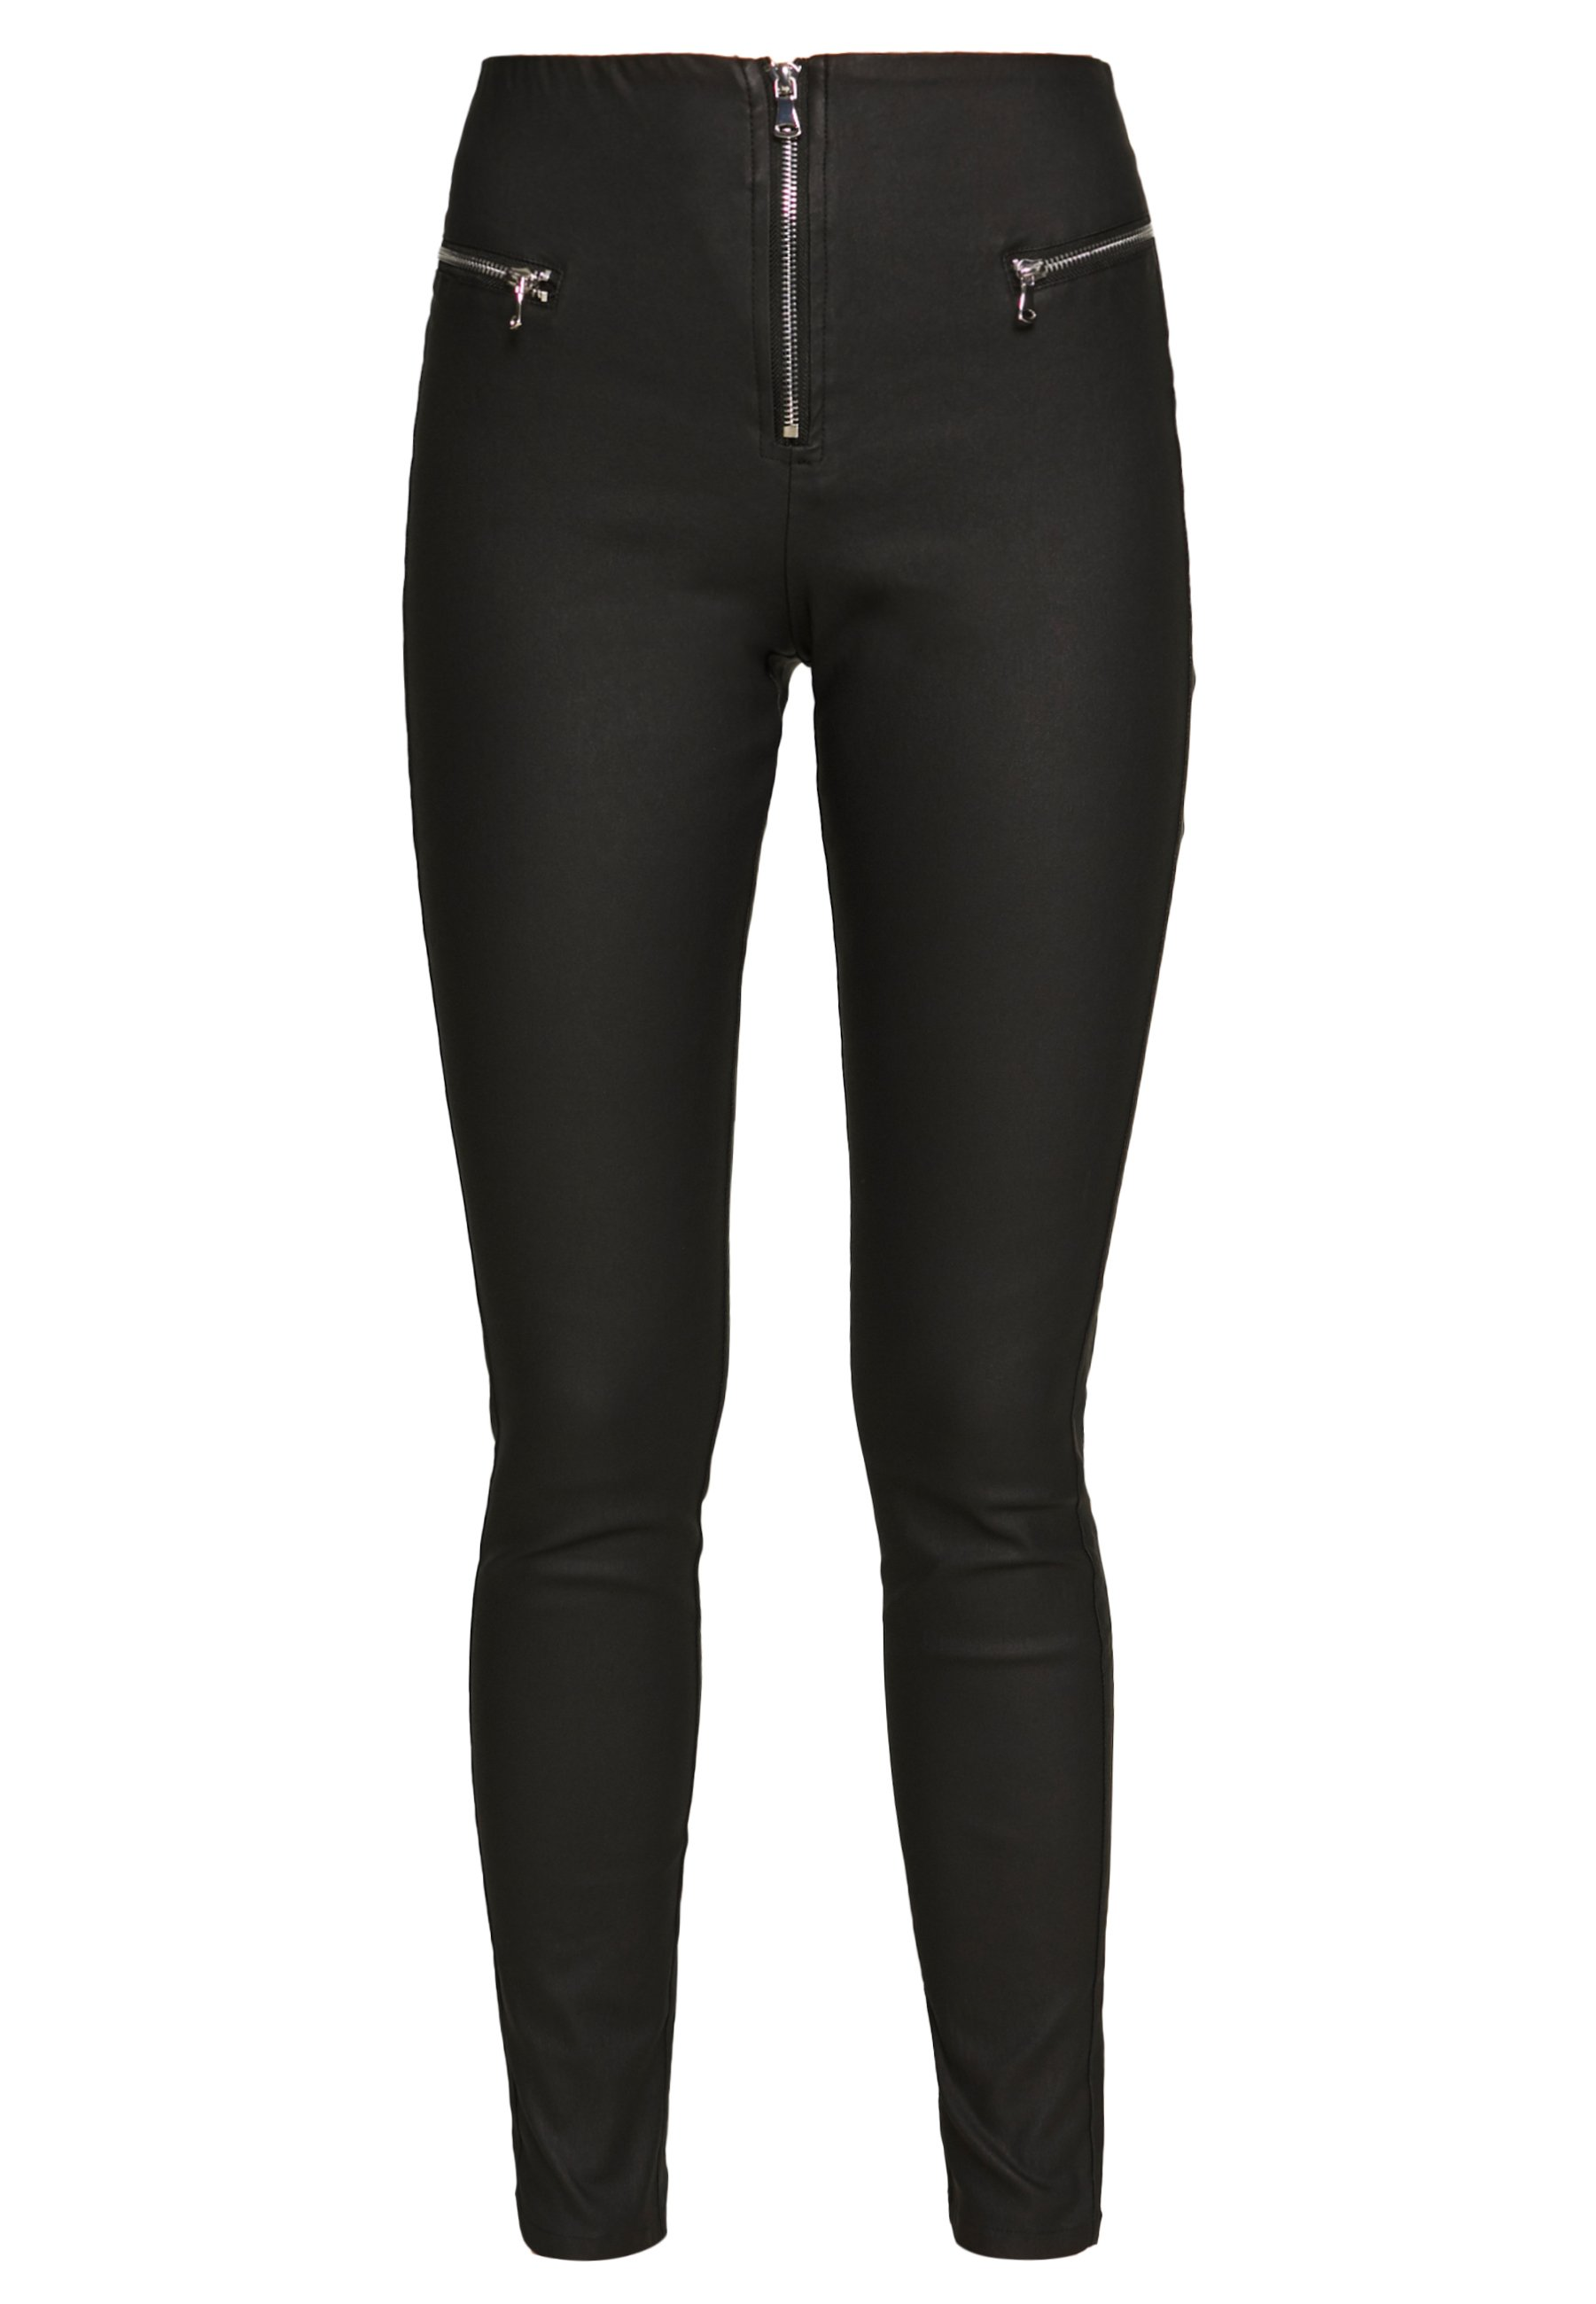 Tiger Mist Pearl Pant - Leggings Black